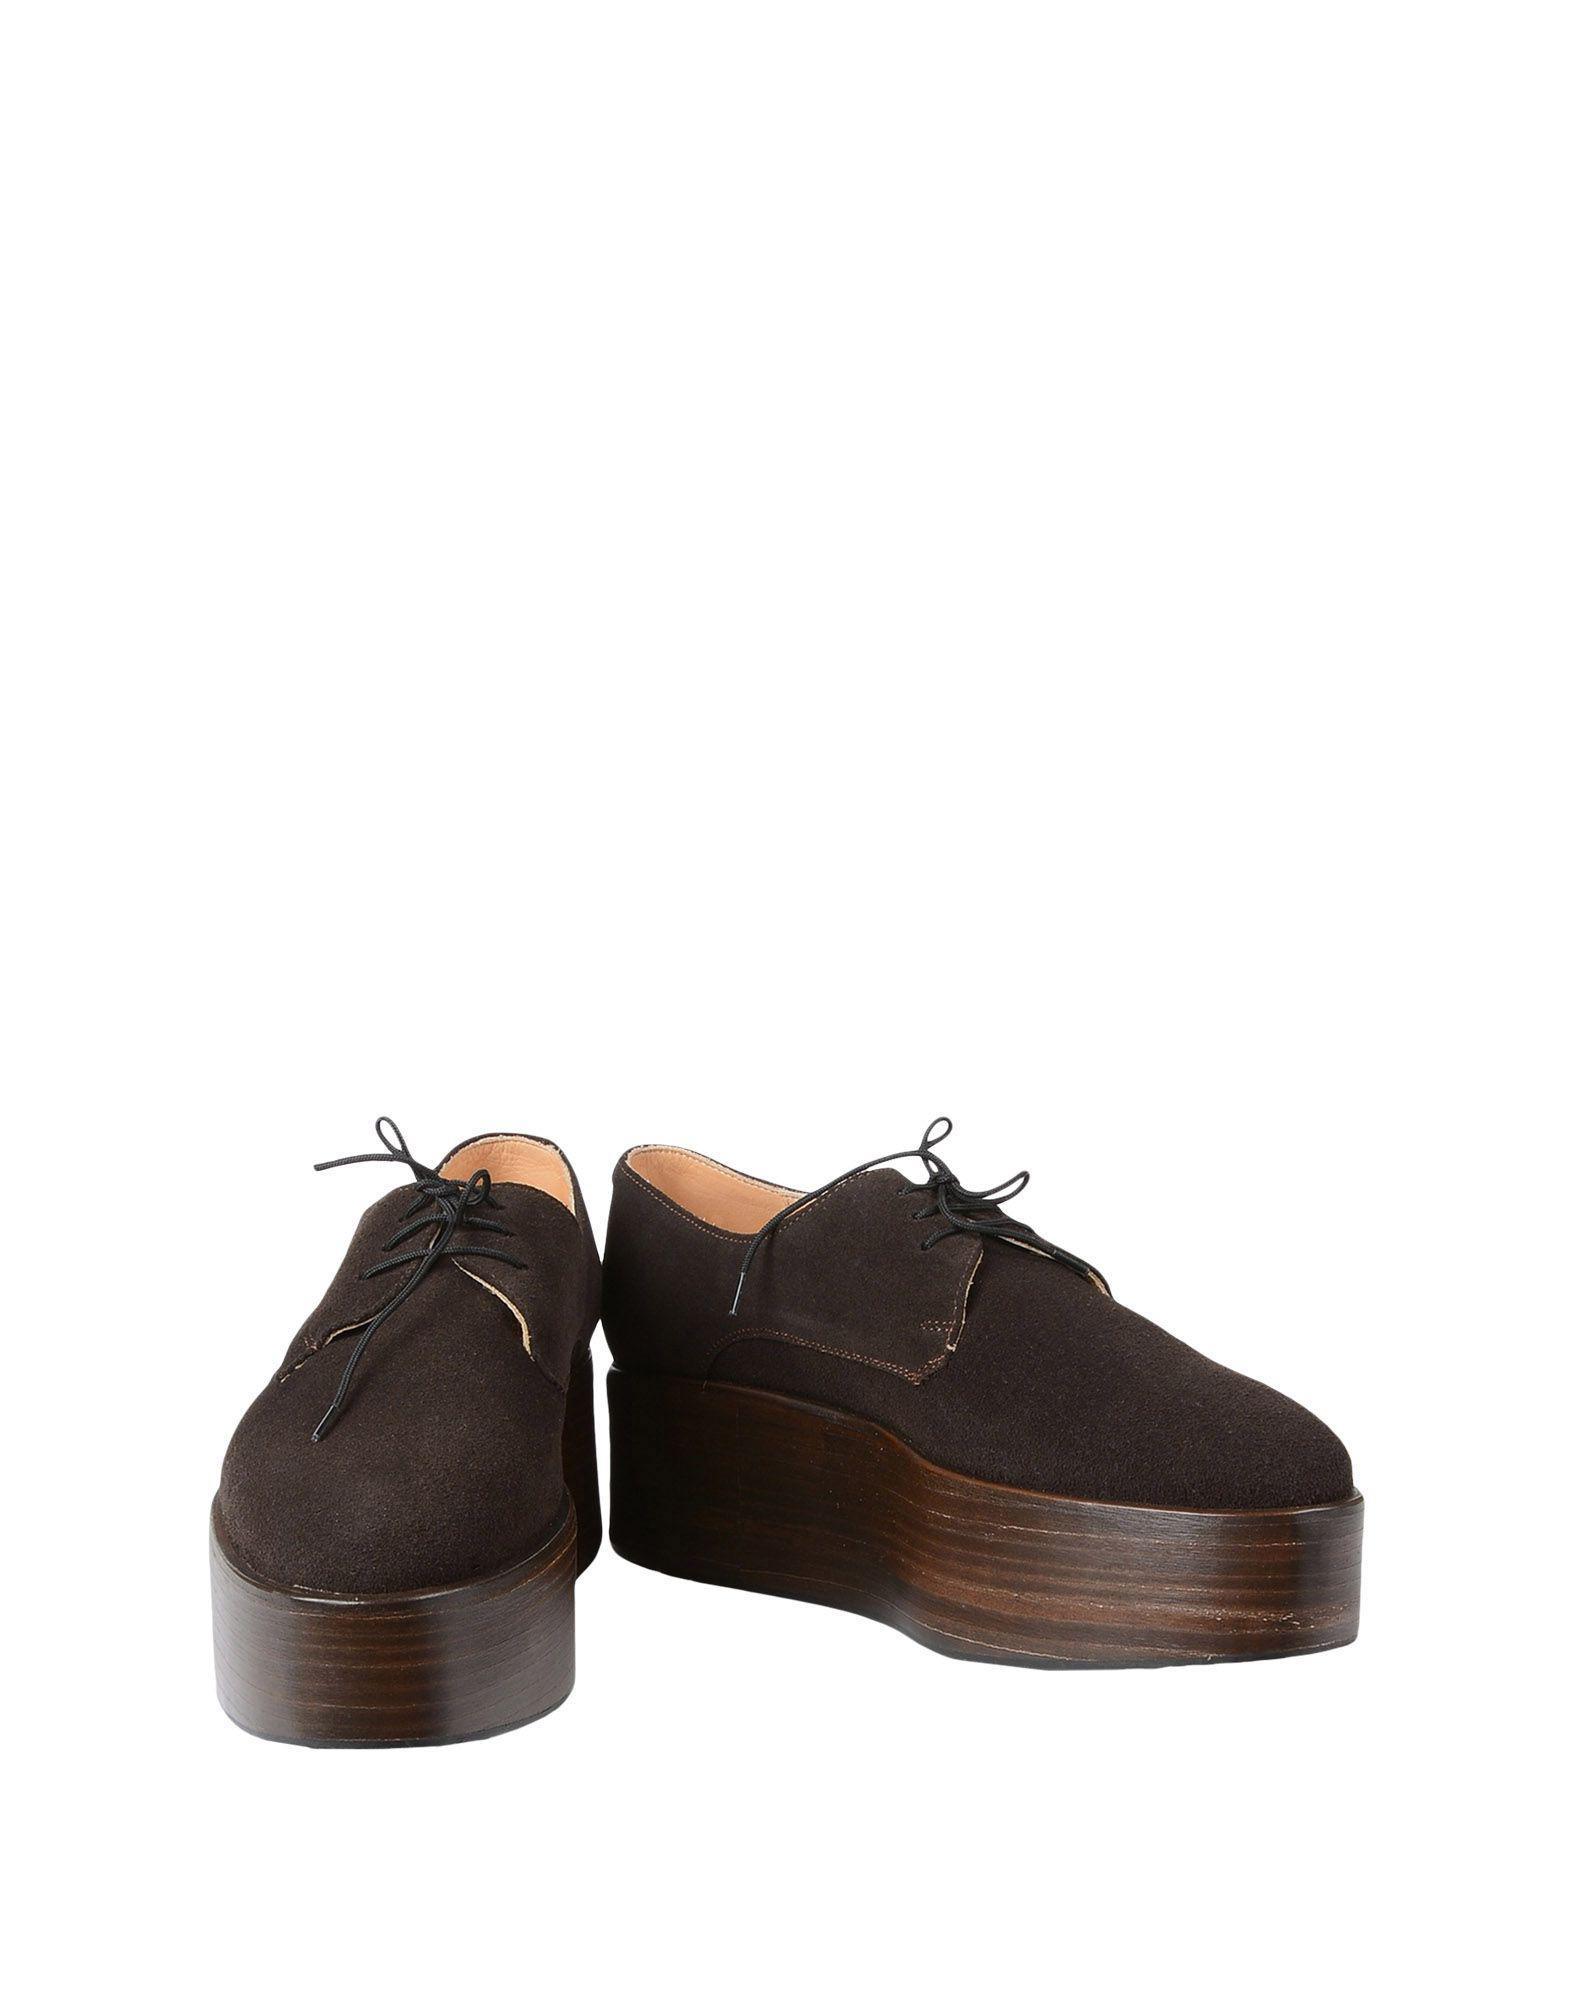 Chaussures - Chaussures À Lacets Dieppa Restrepo XOFGm